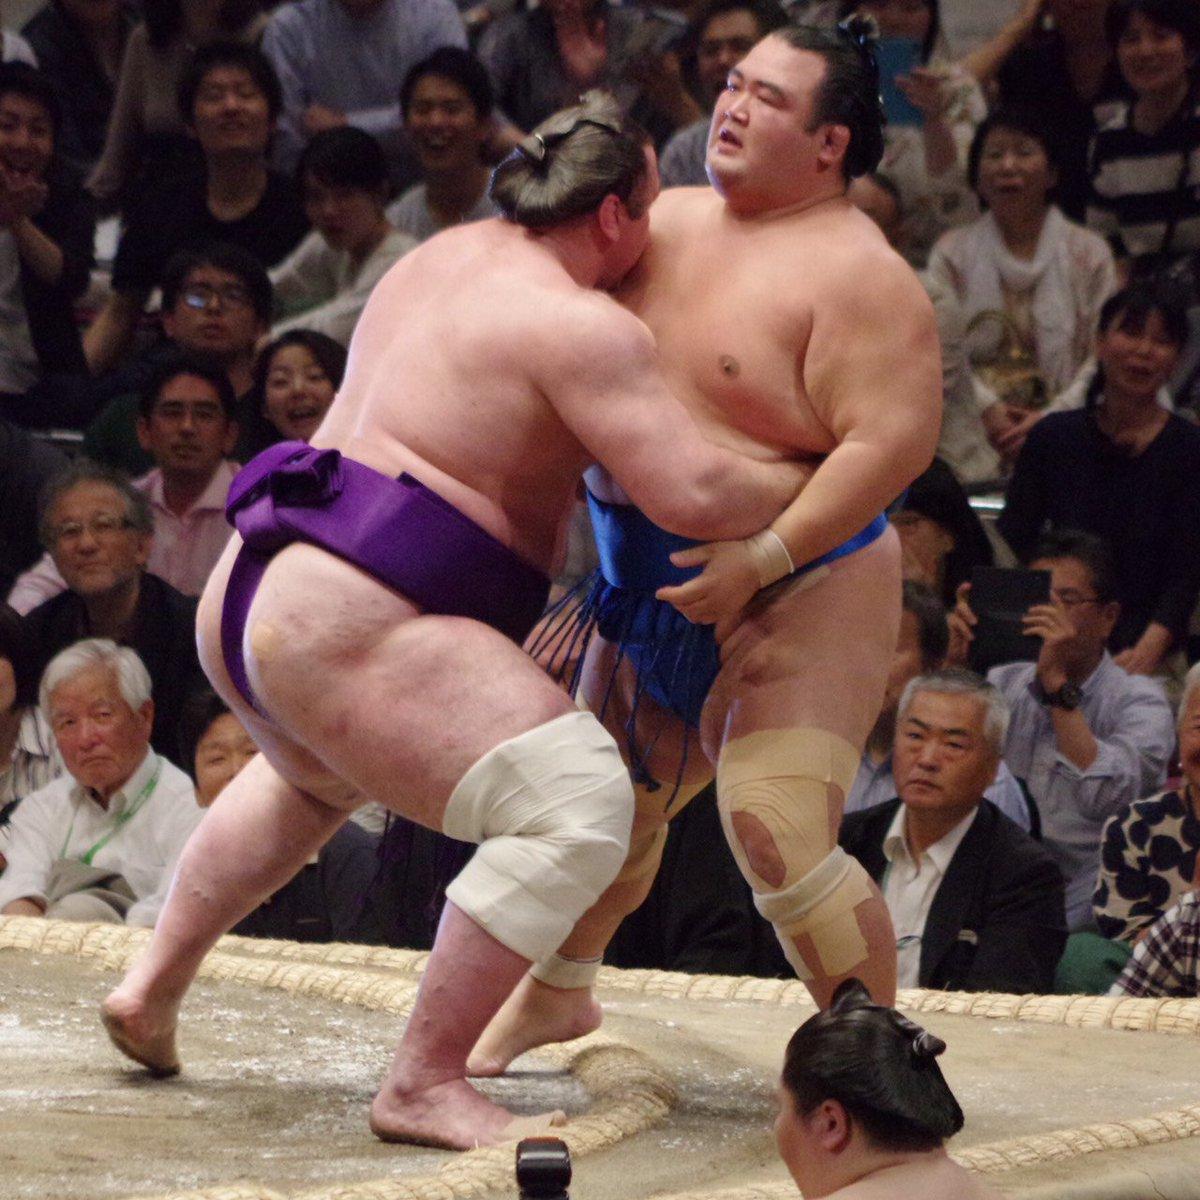 test ツイッターメディア - <七日目の様子> 幕内取組。 栃ノ心(7勝0敗) 寄り切り 琴奨菊(2勝5敗)。#sumo #相撲 https://t.co/P9vcgopJPF